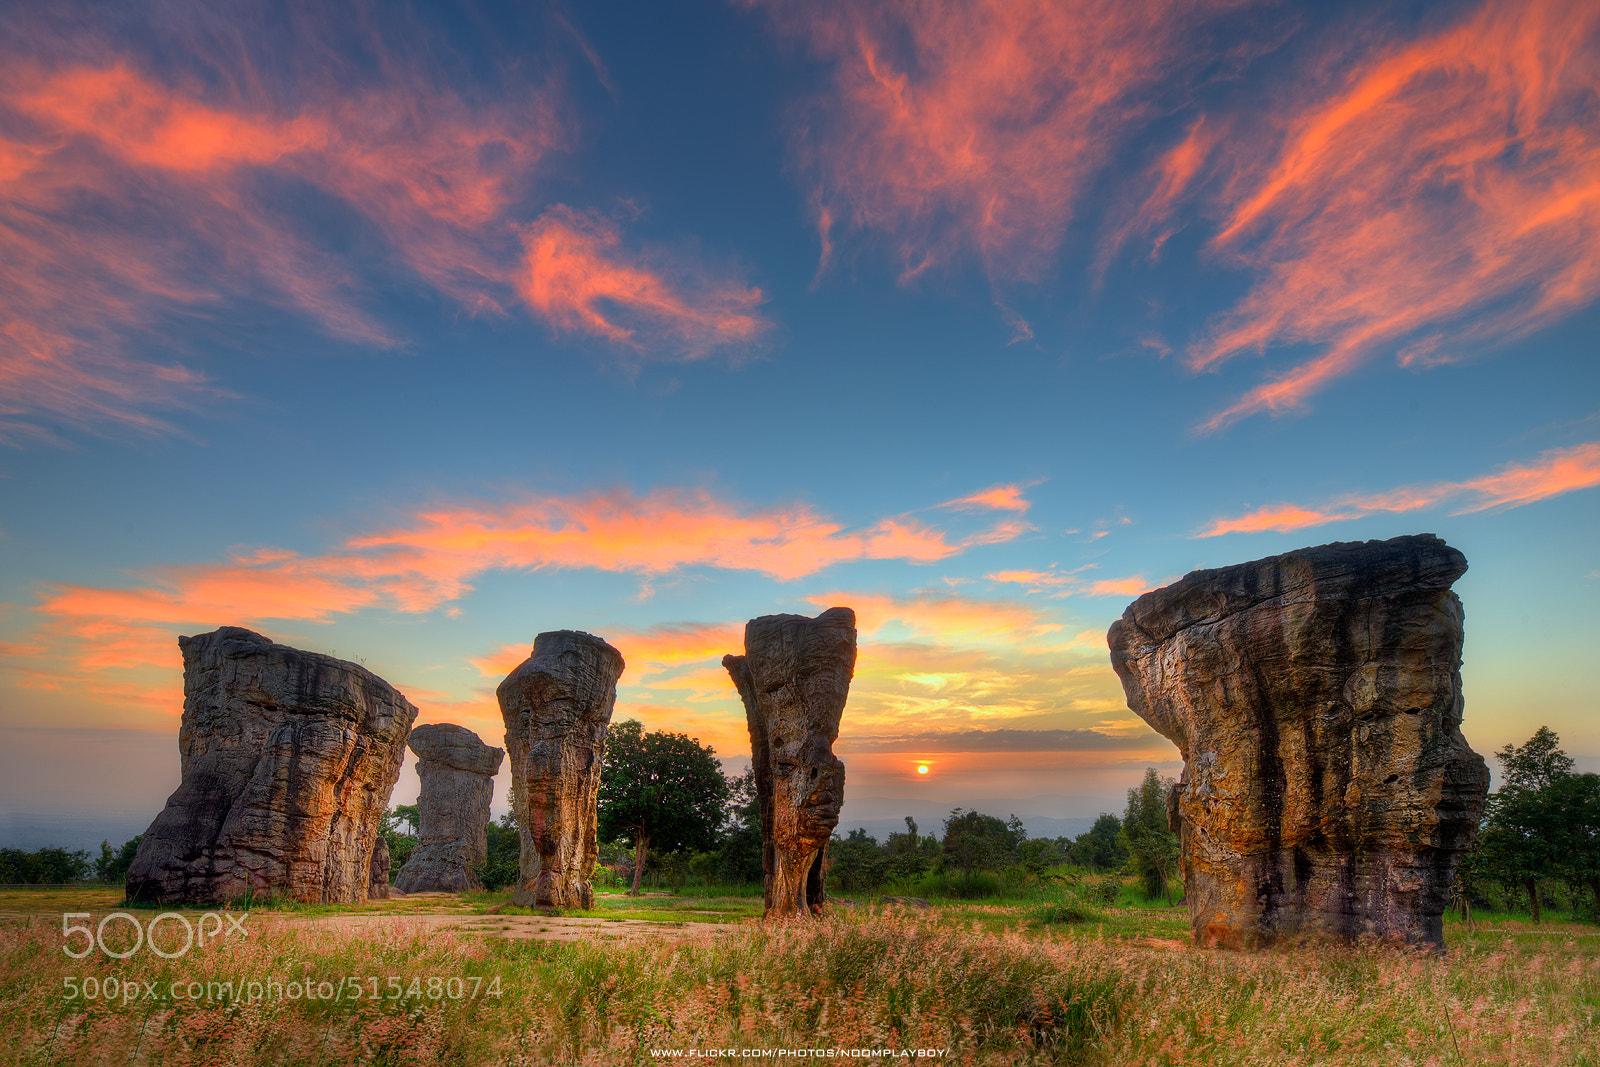 Photograph Sunrise : Mo Hin Khao (Stonehenge of Thailand) by noomplayboy  on 500px